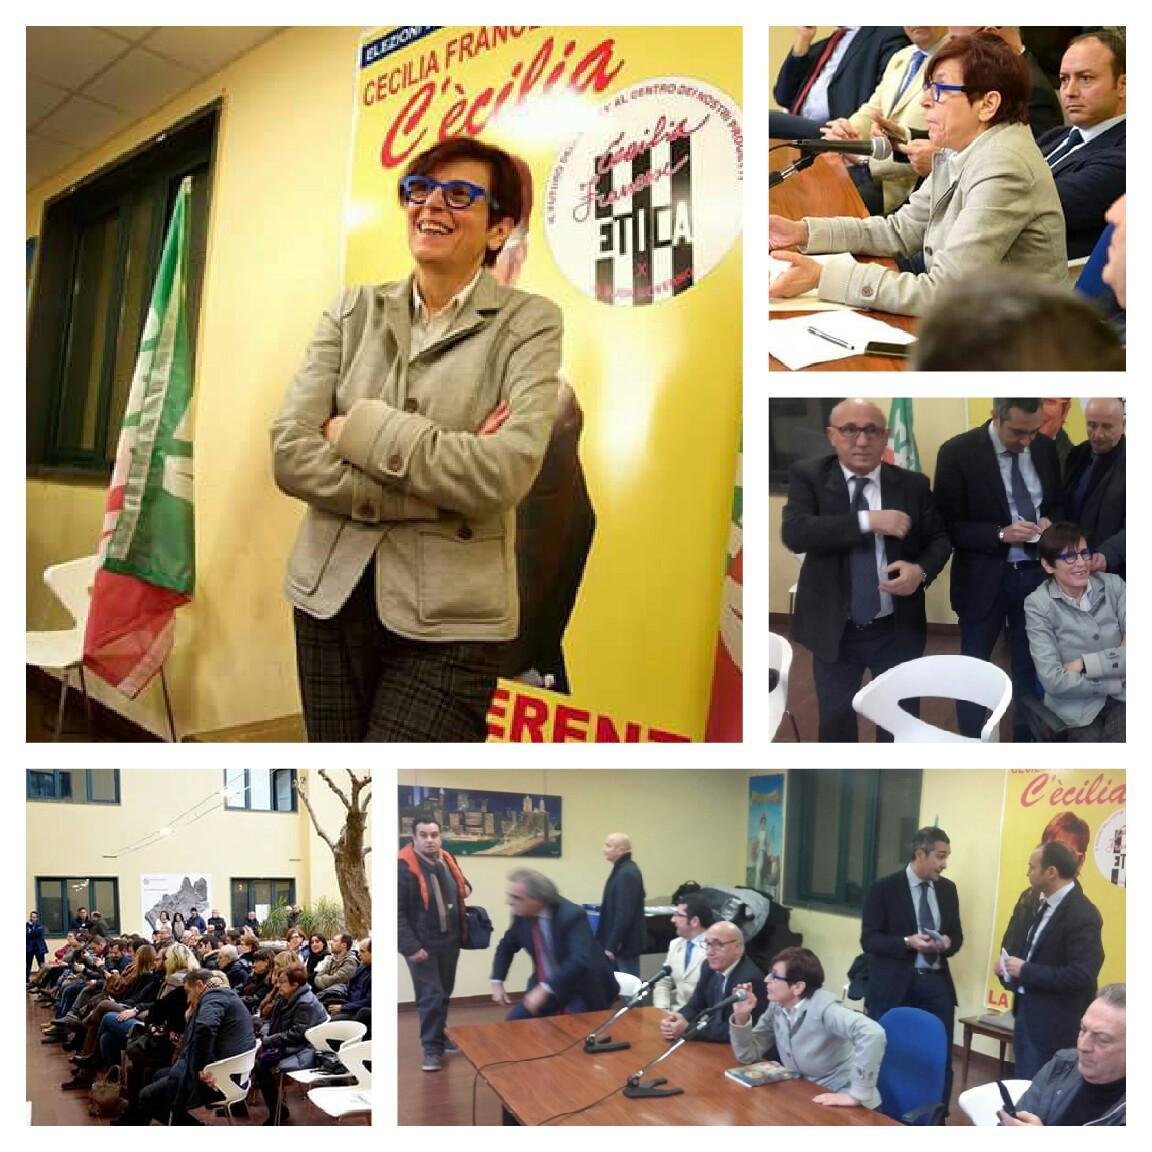 Cecilia-Francese-conferenza-stampa-mix.jpg